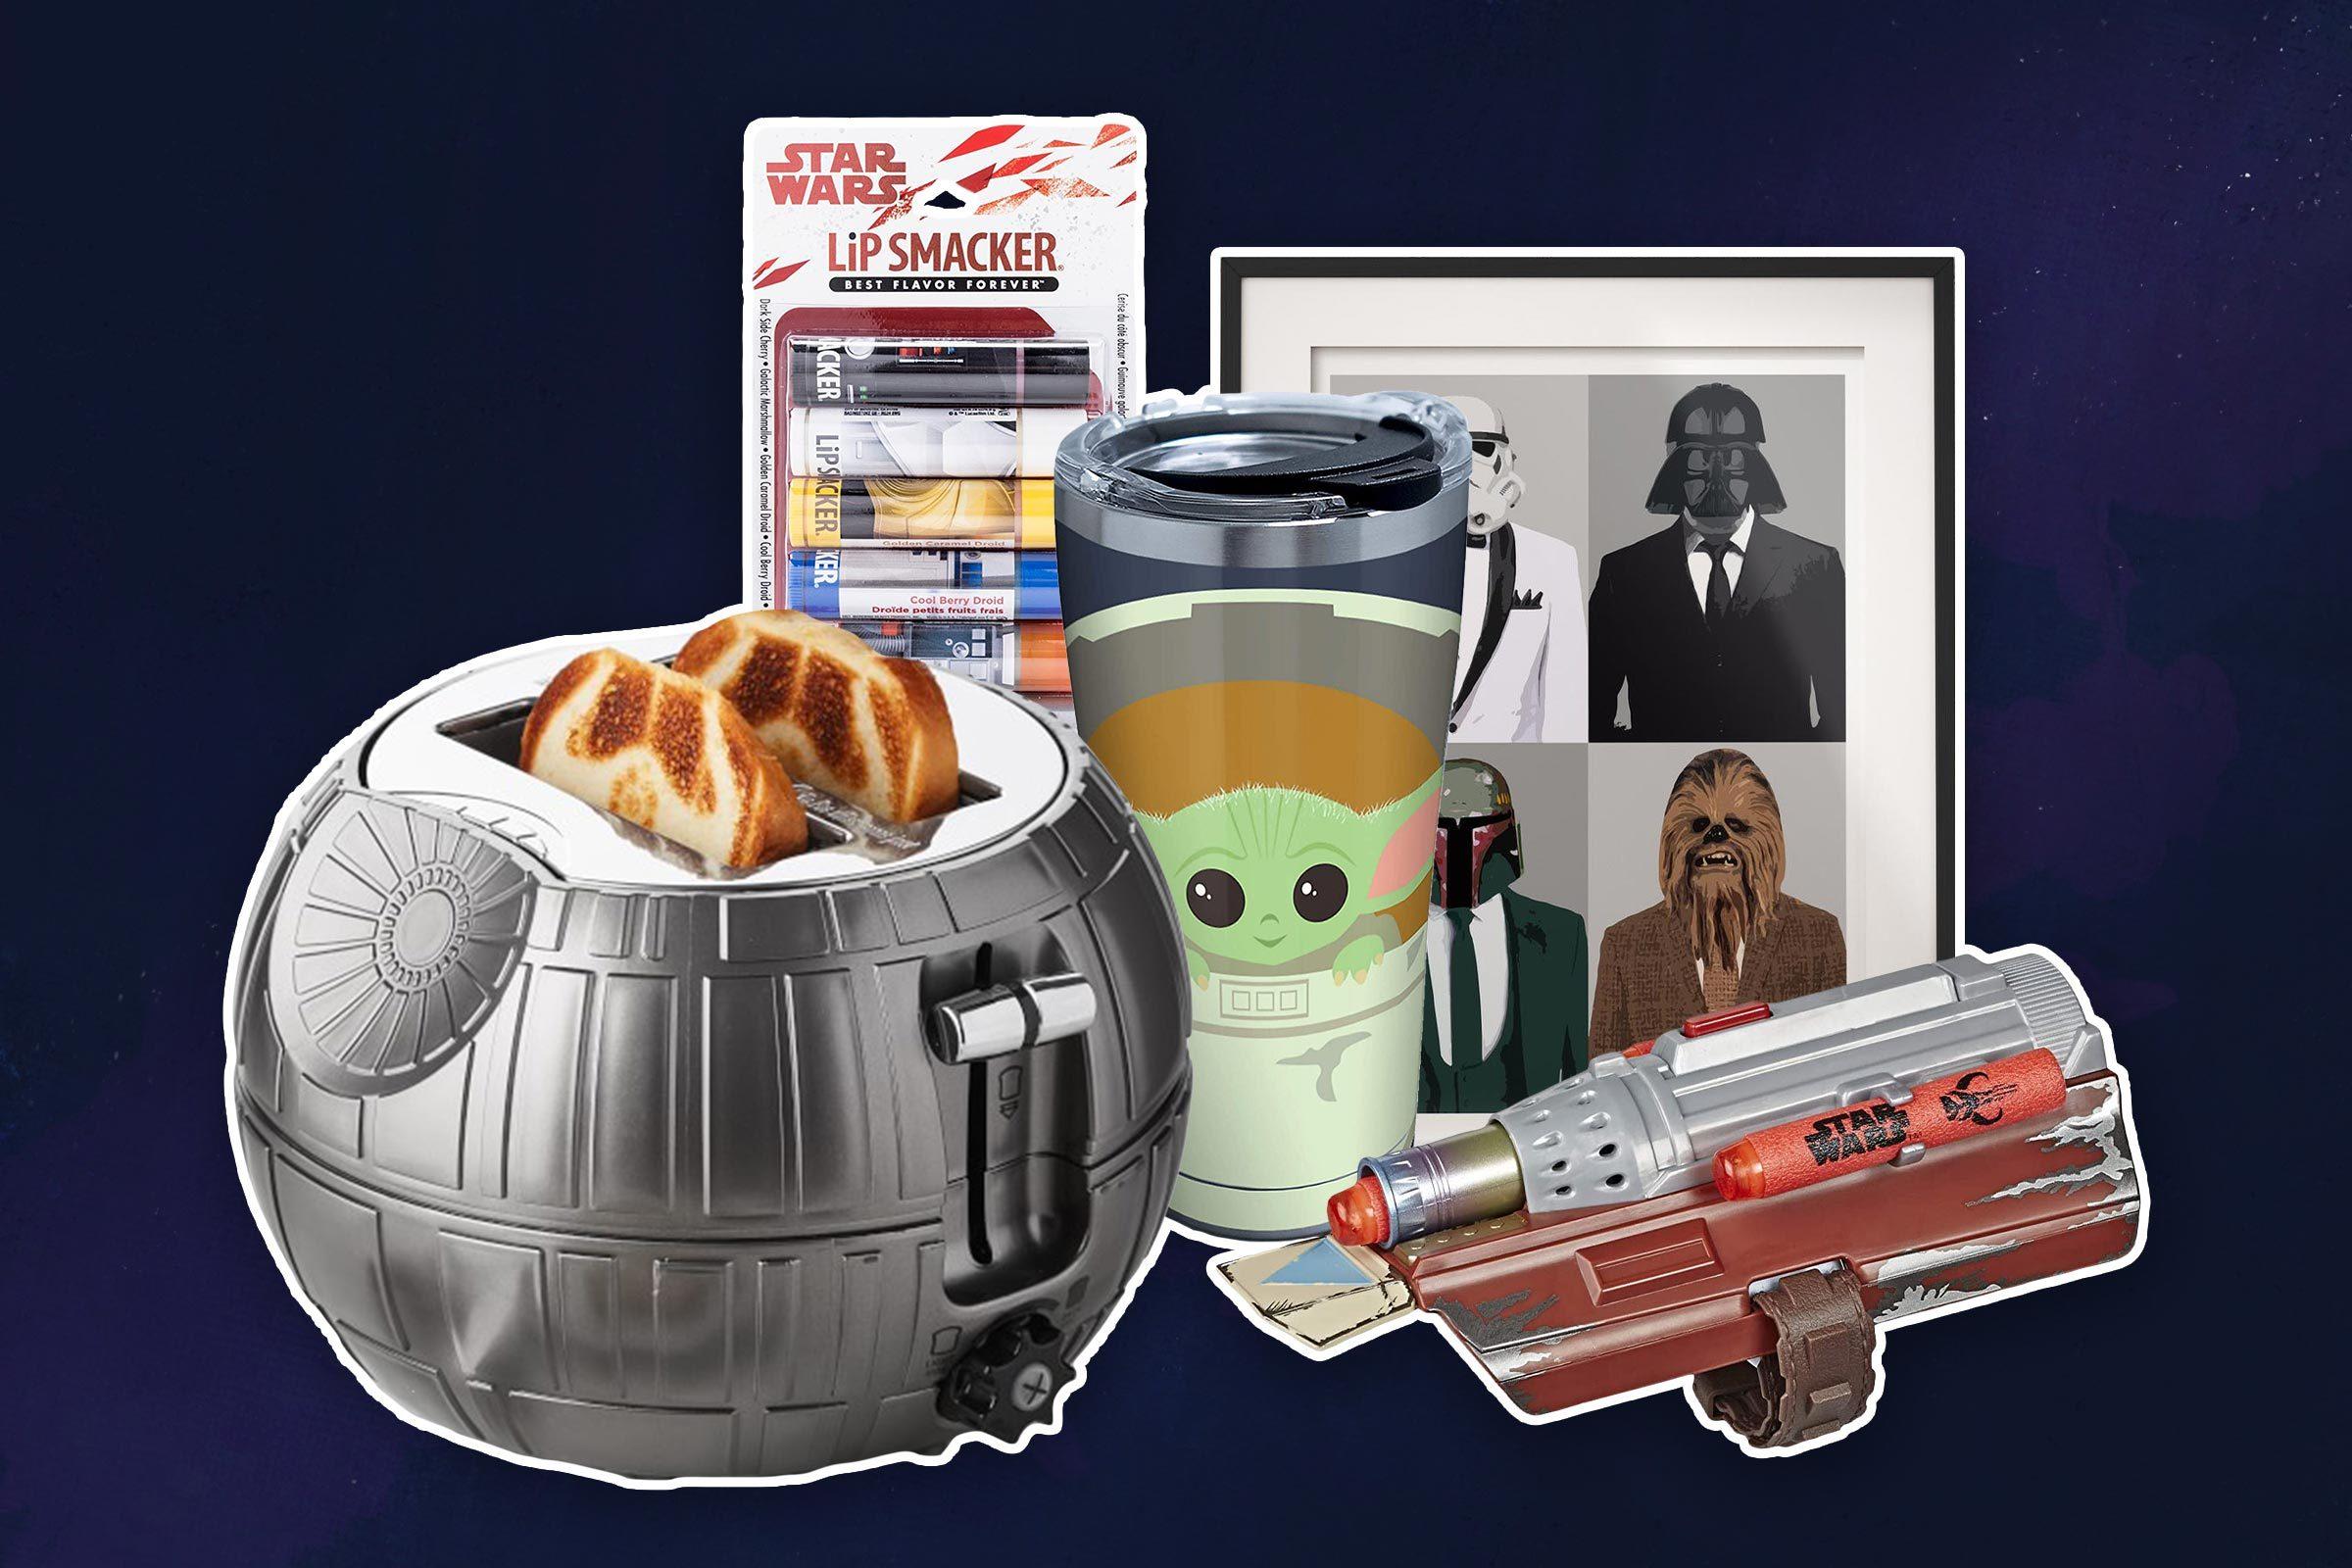 Star Wars gift idea